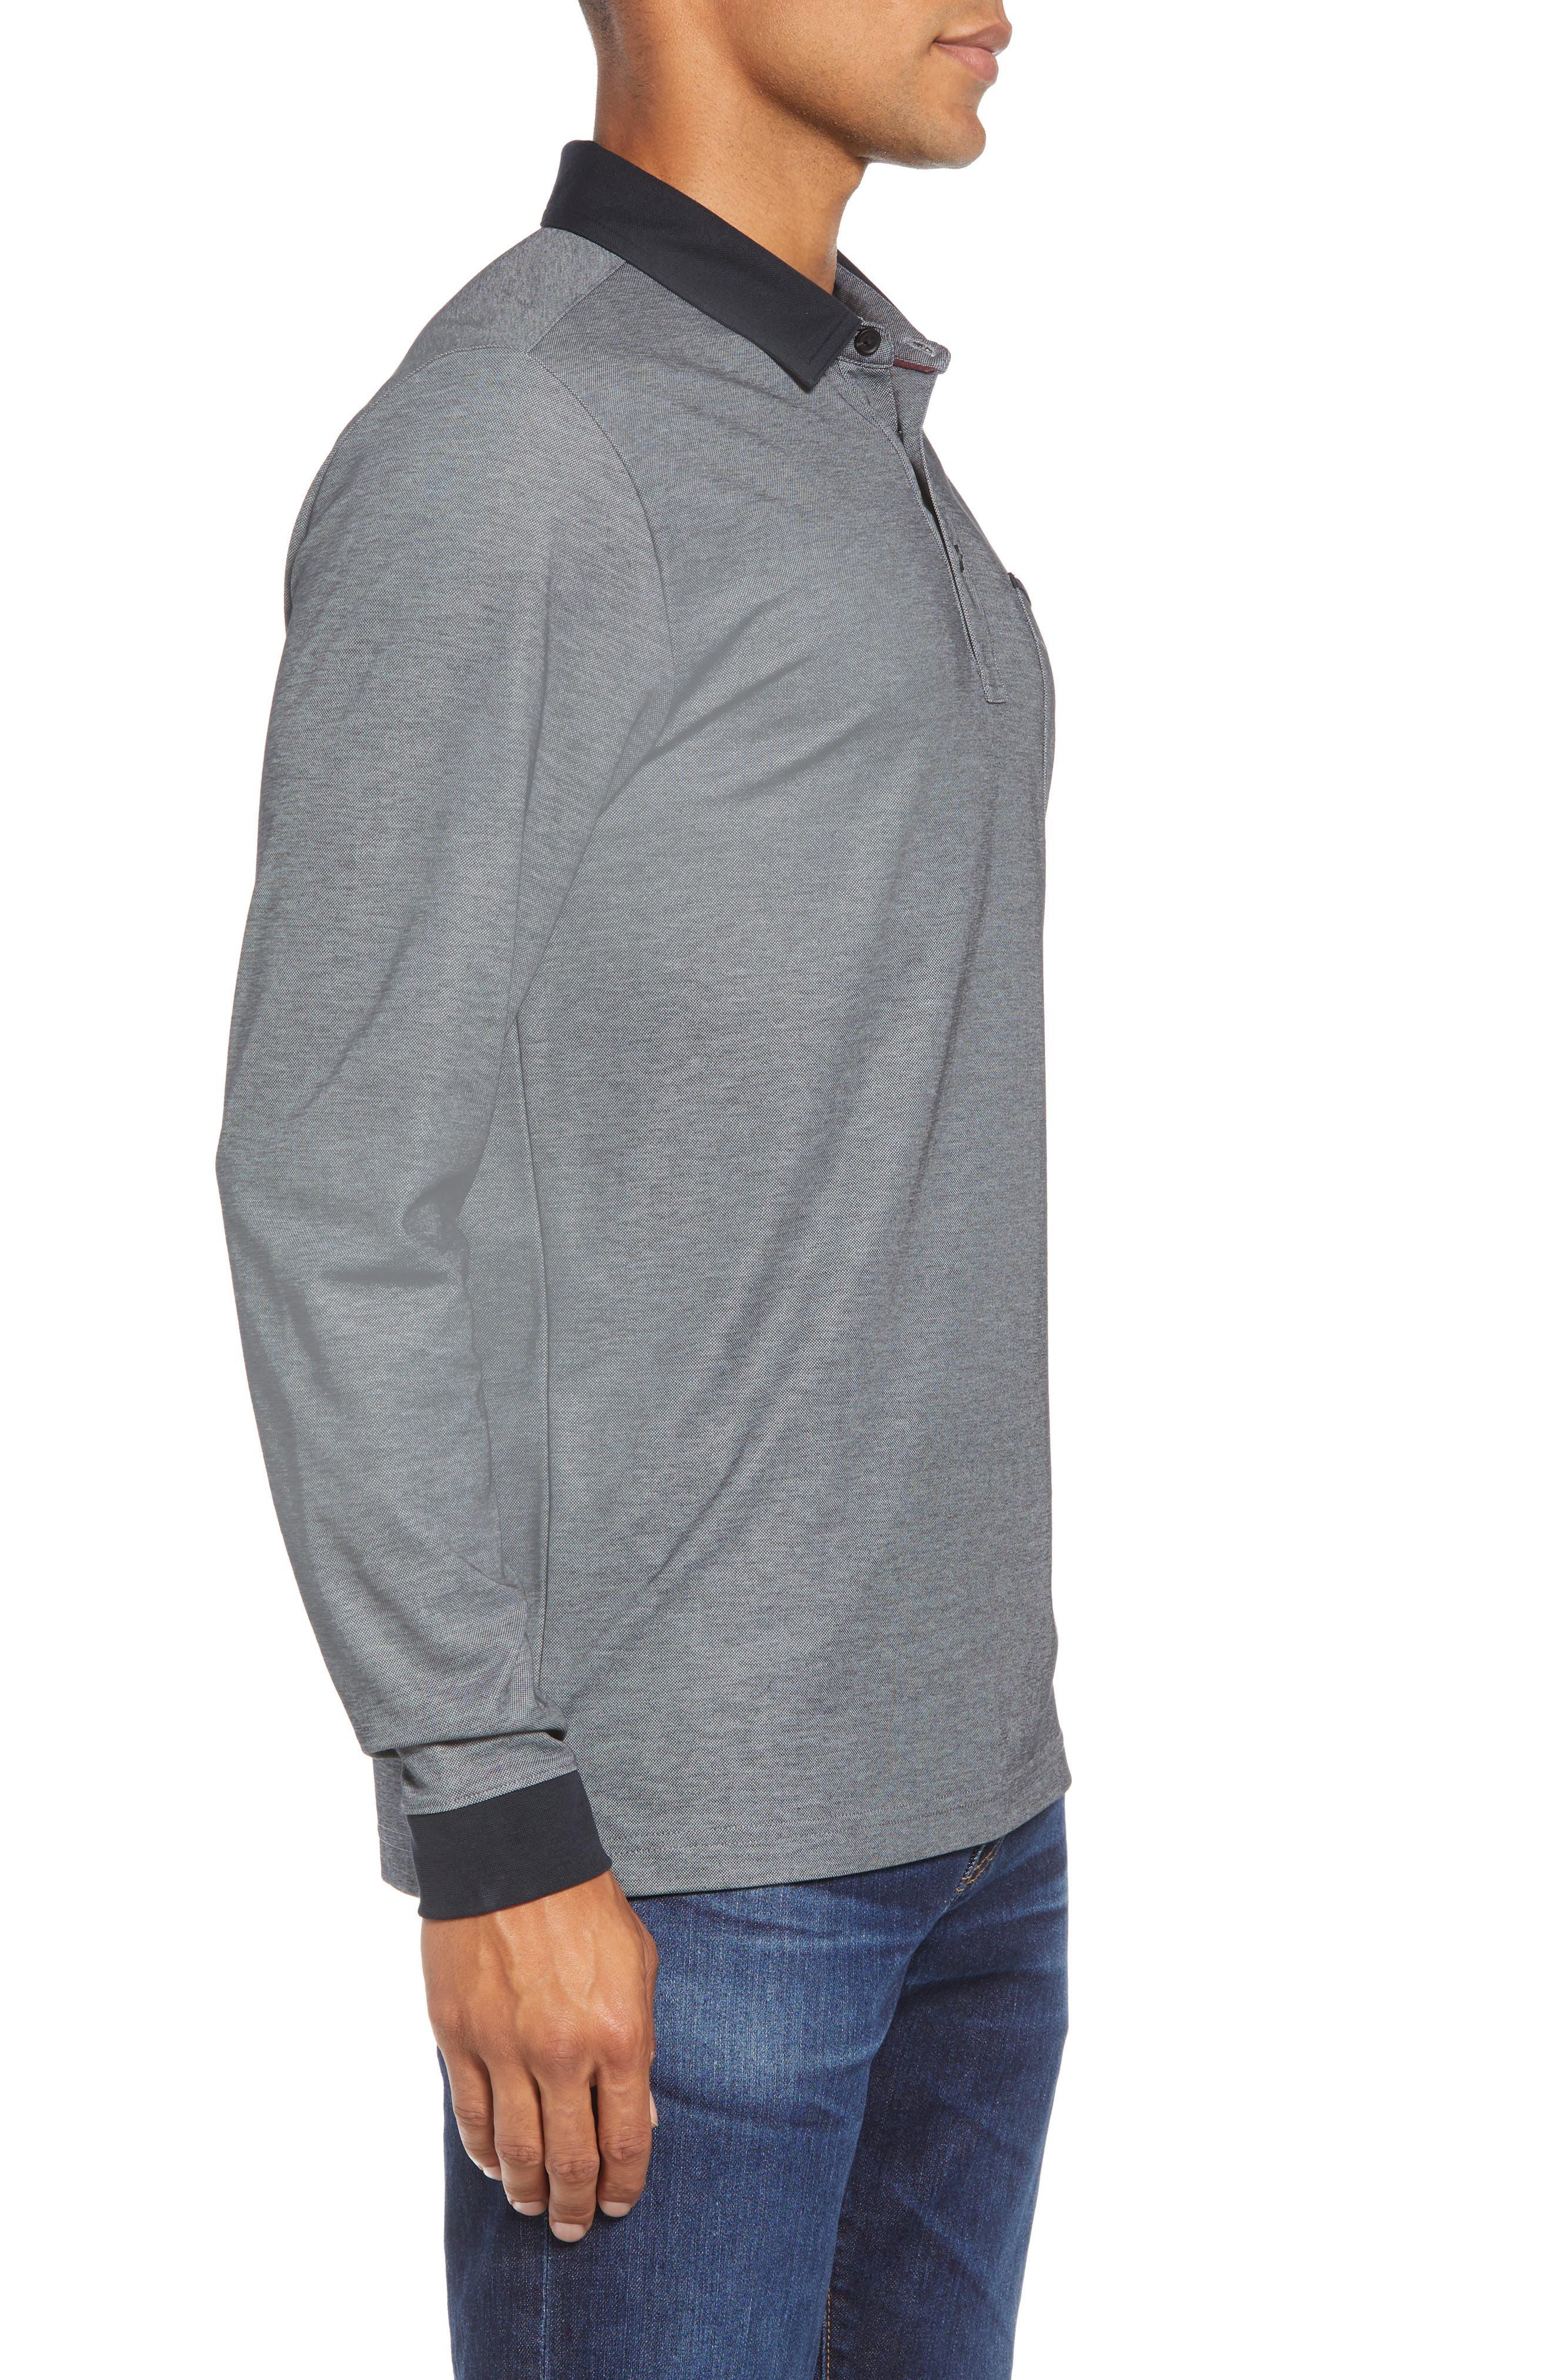 Kay Regular Fit Long Sleeve Polo Shirt,                             Alternate thumbnail 3, color,                             HEATHER CASTLEROCK